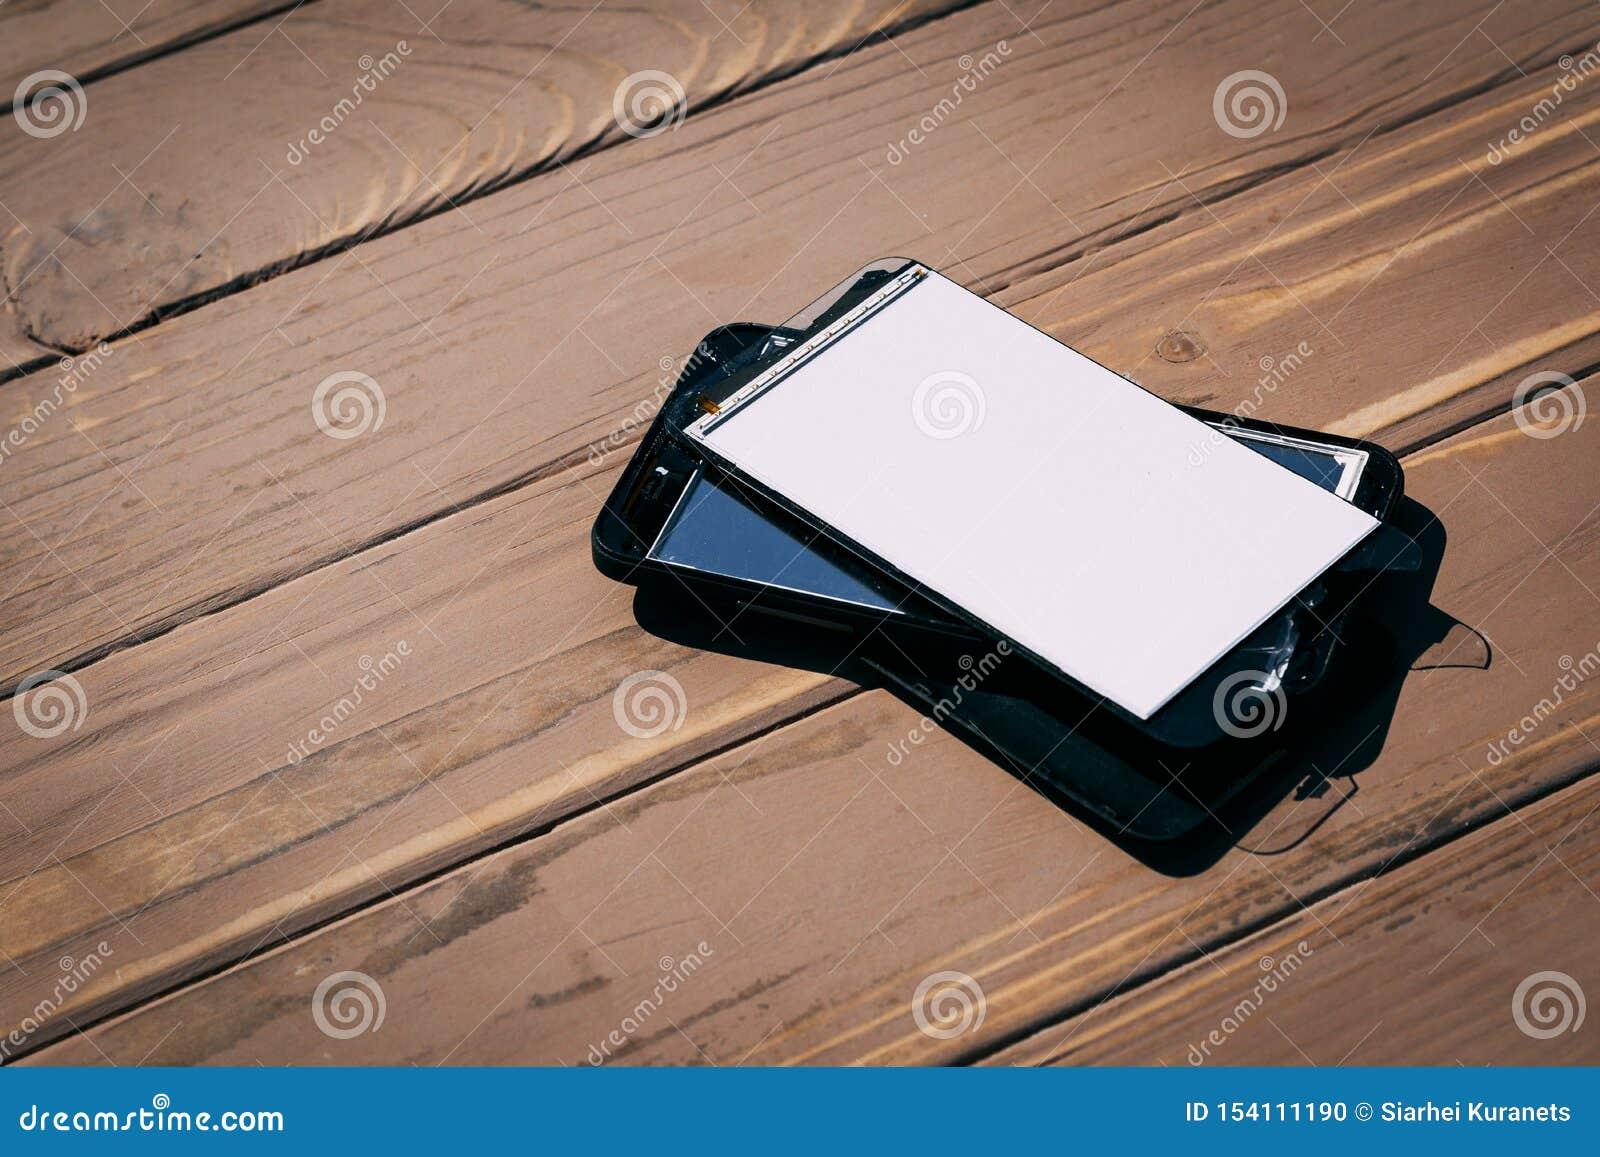 Daglicht Gebroken mobiele telefoon Houten achtergrond heb het stemmen